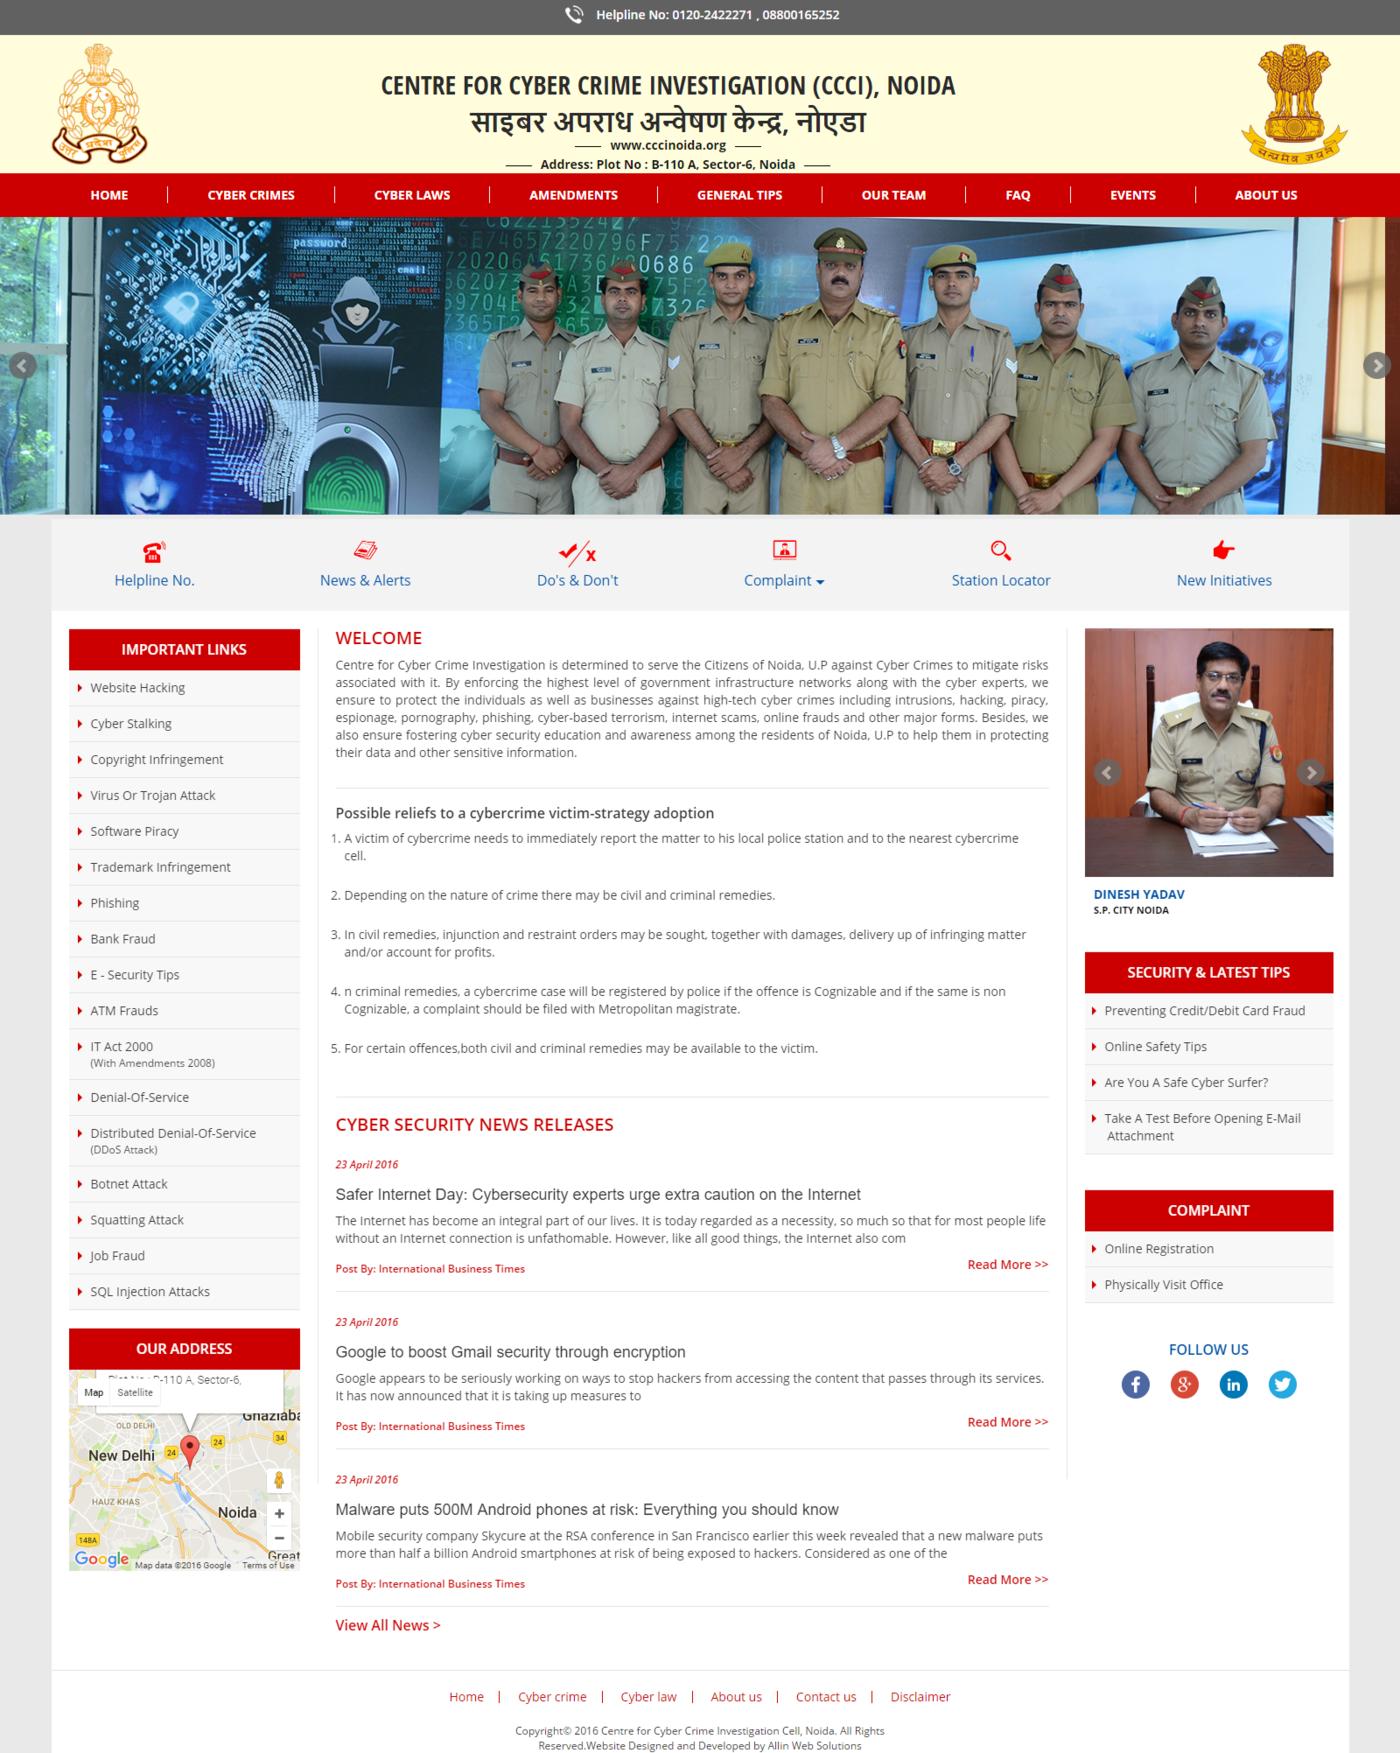 Center For Cyber Crime Investigation, Noida by Naveen Kumar